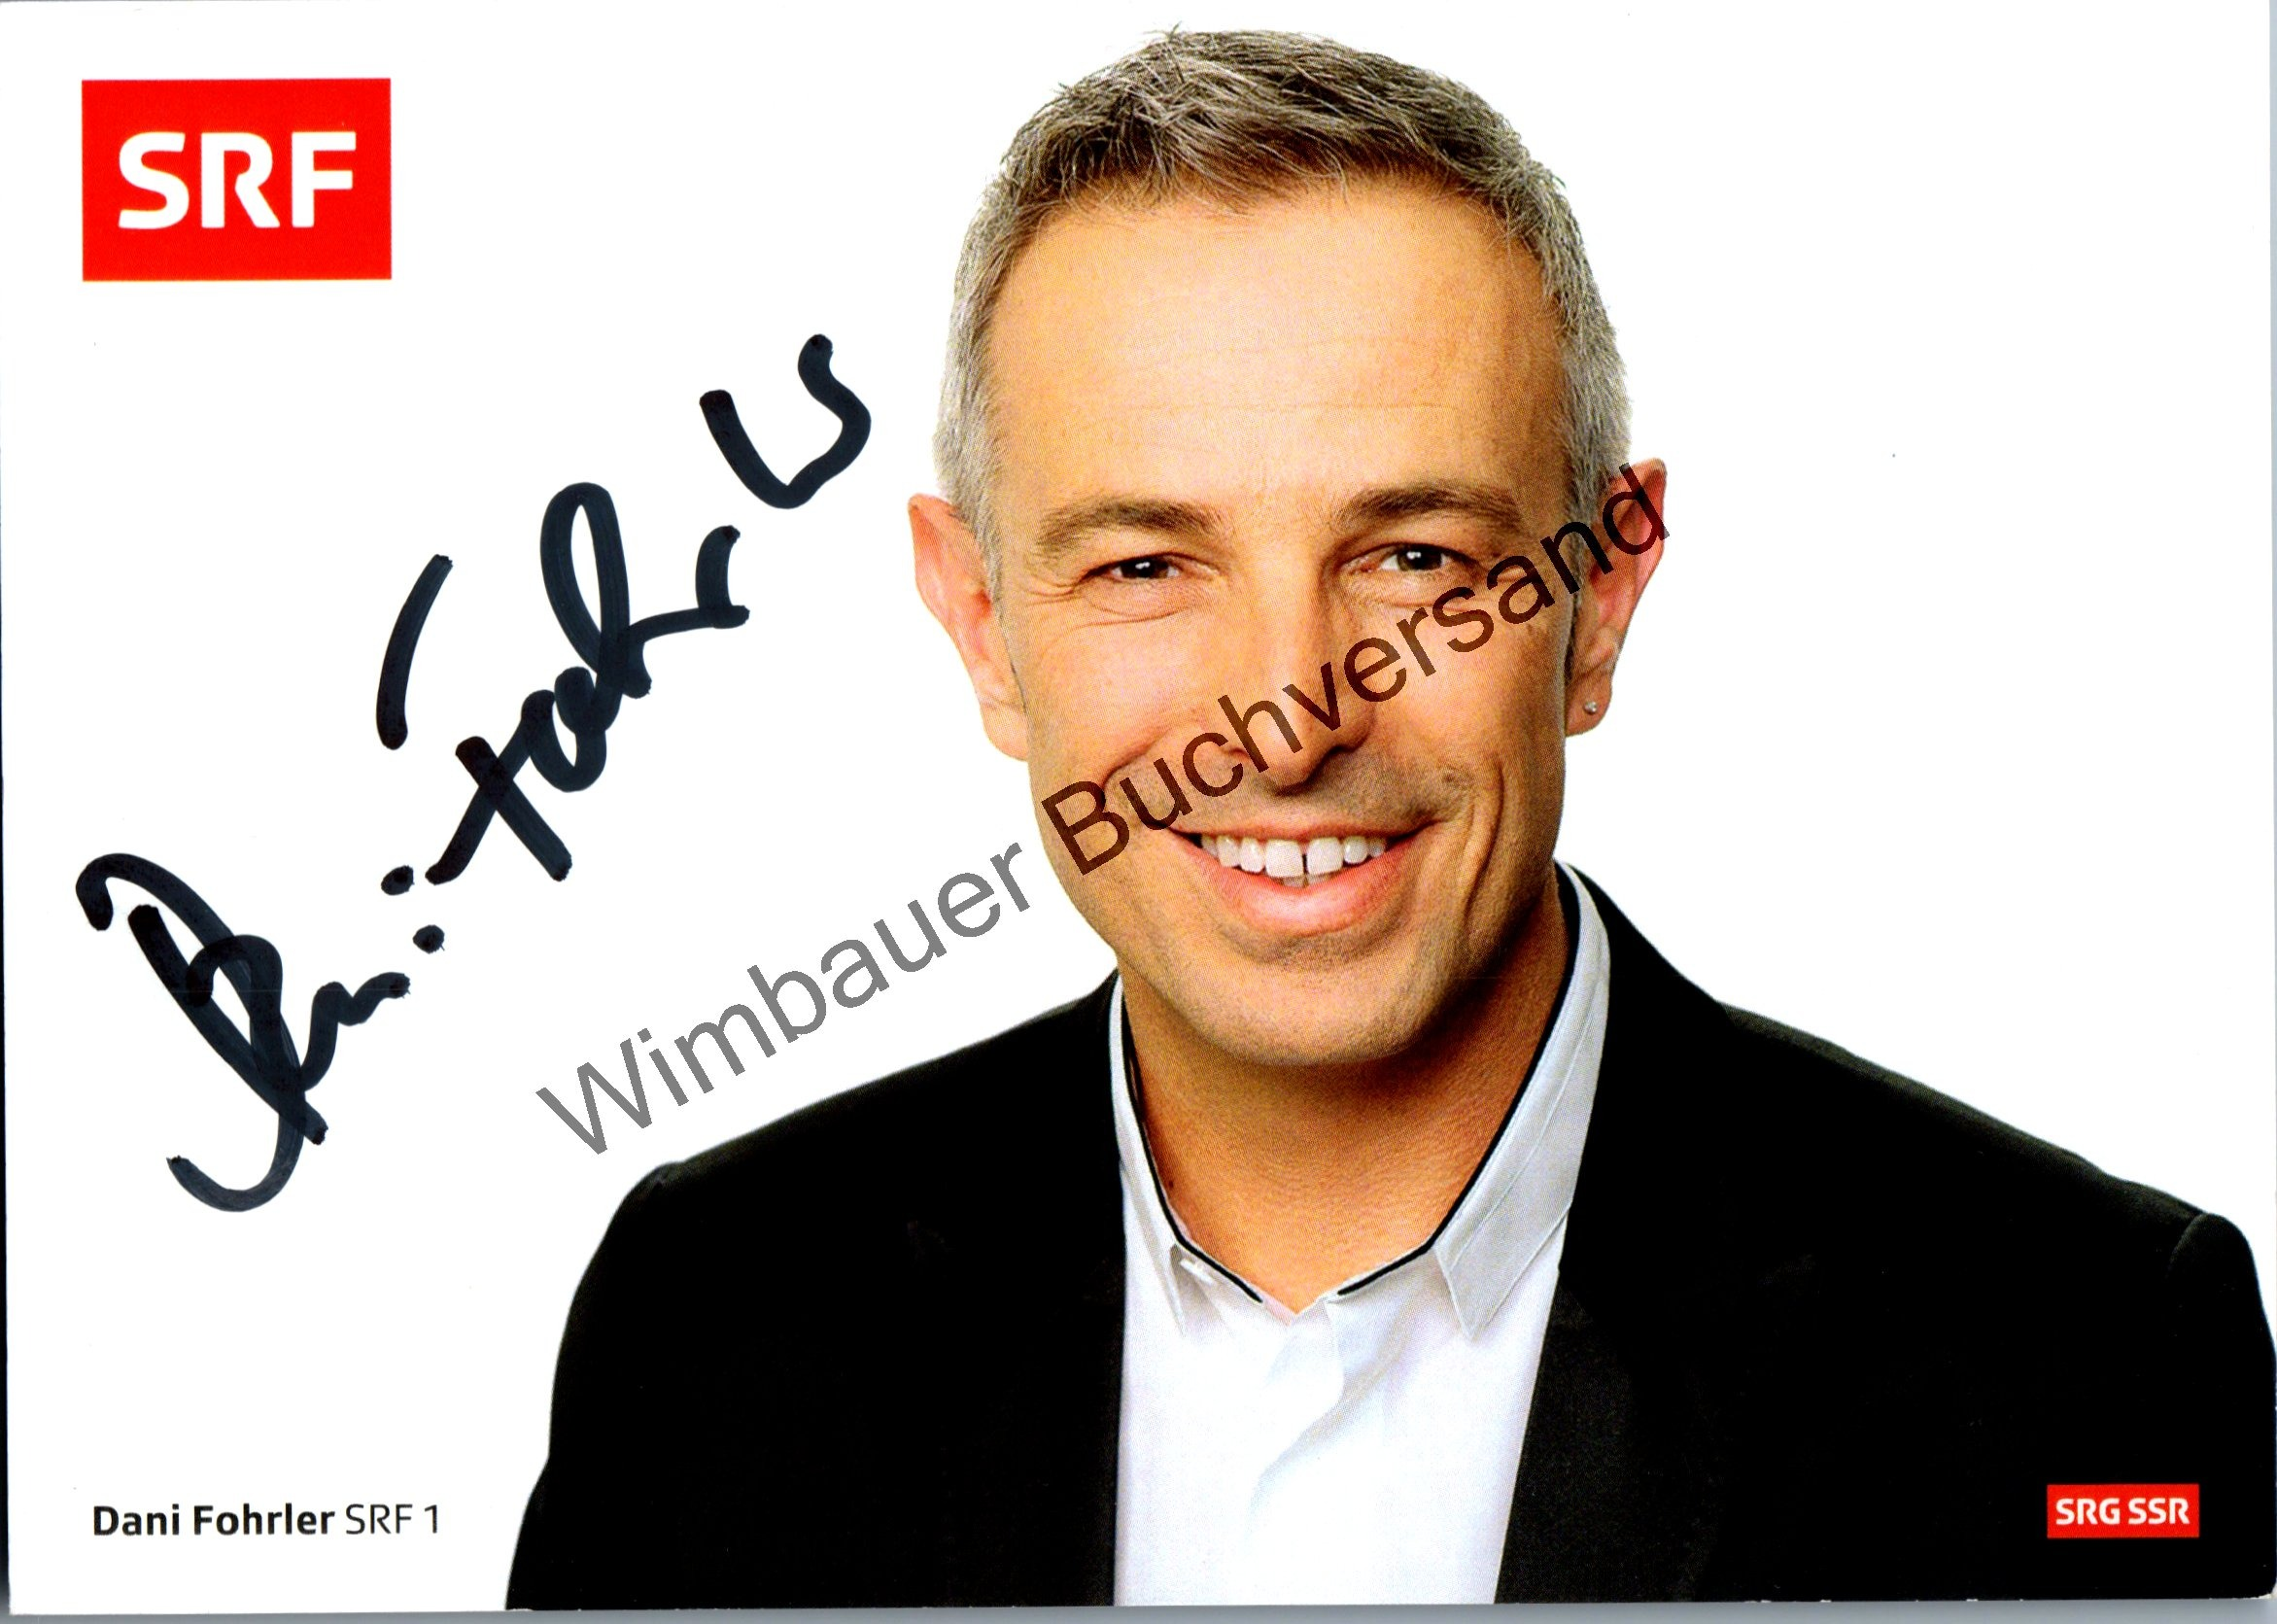 Original Autogramm Dani Fohrler SRF /// Autograph signiert signed signee